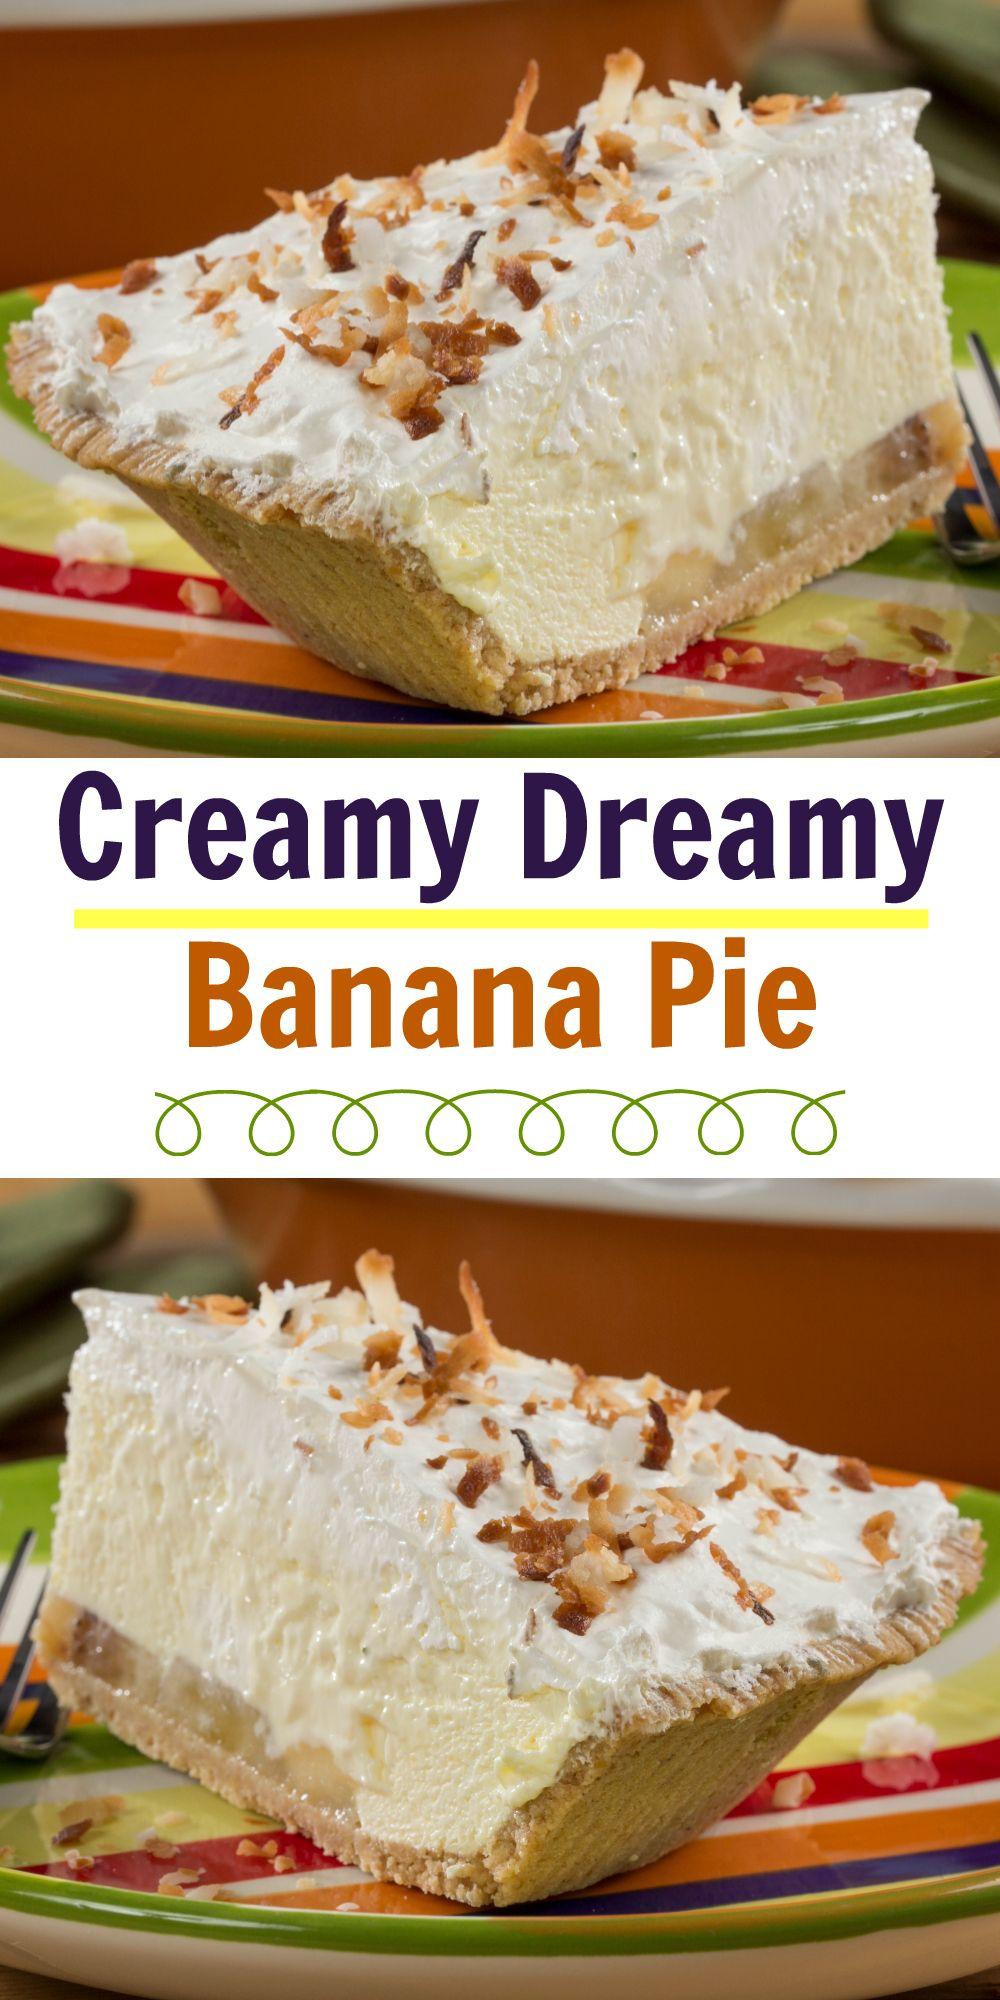 Creamy dreamy banana pie recipe diabetic friendly